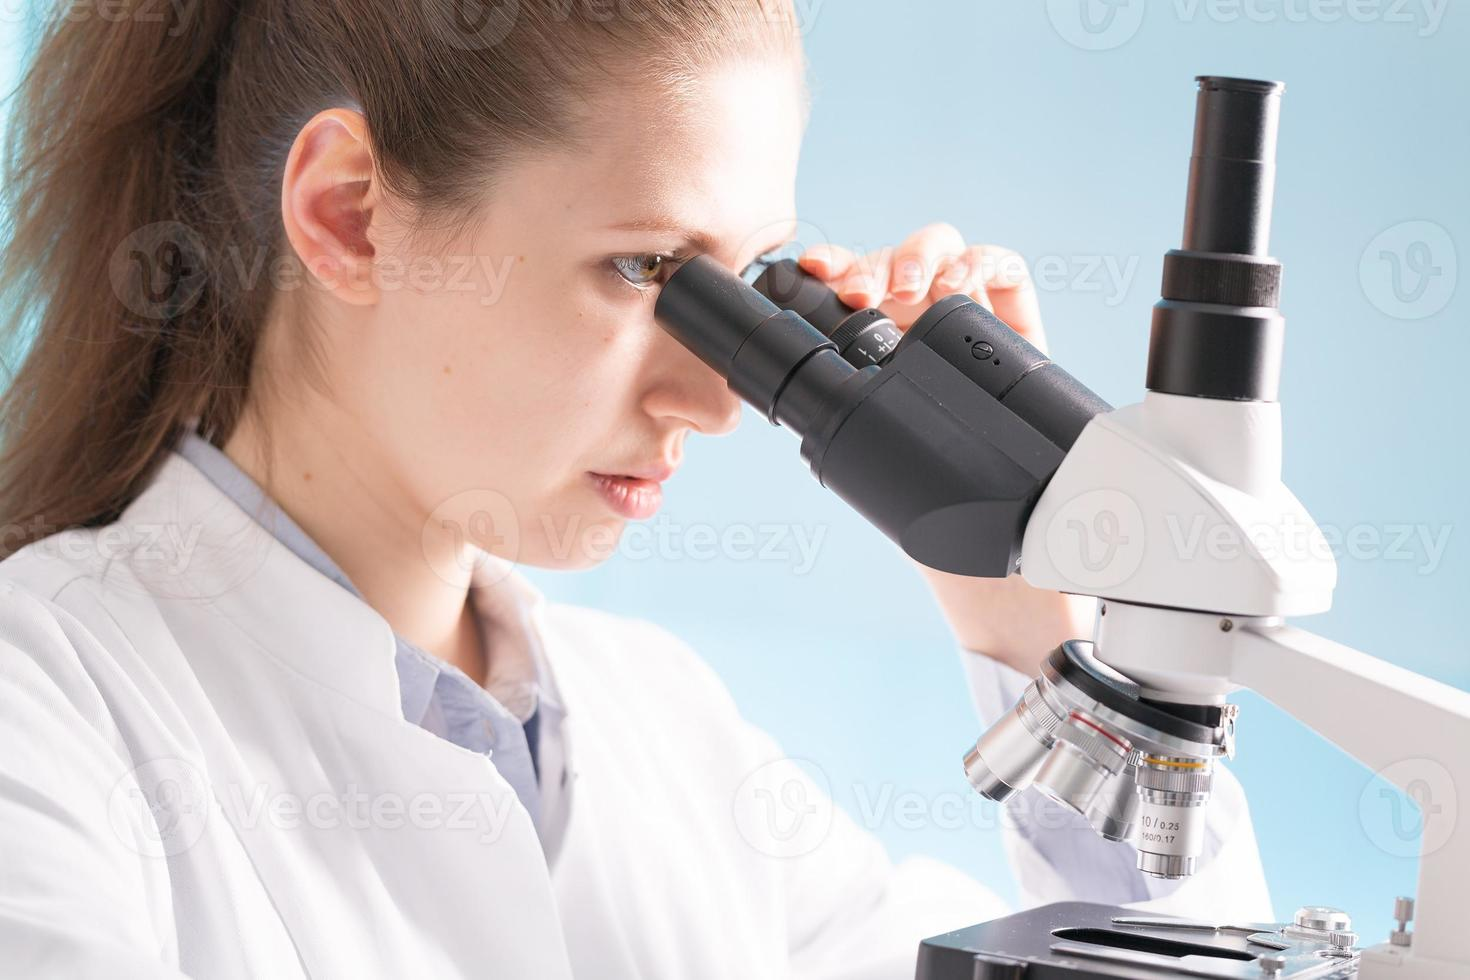 vrouw in microbiologisch laboratorium foto